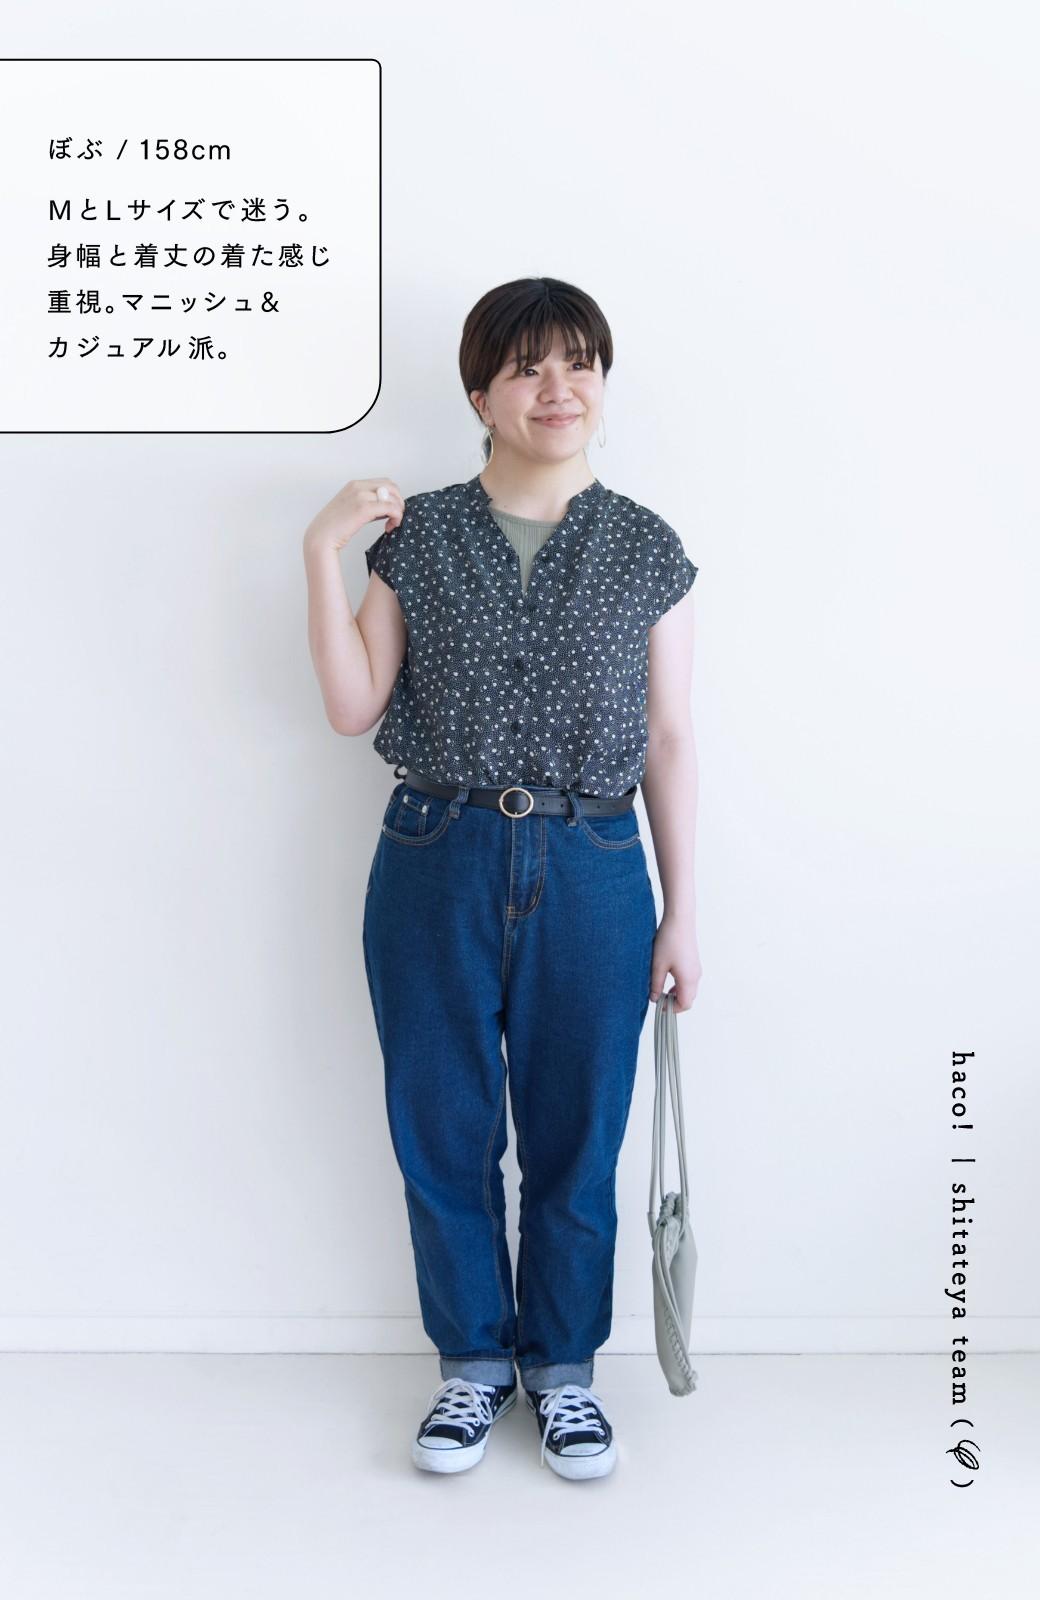 haco! (φ)ぱっと着て顔周り華やか!お仕事も普段にもしっかり着映える女っぽブラウス <アイボリー>の商品写真23